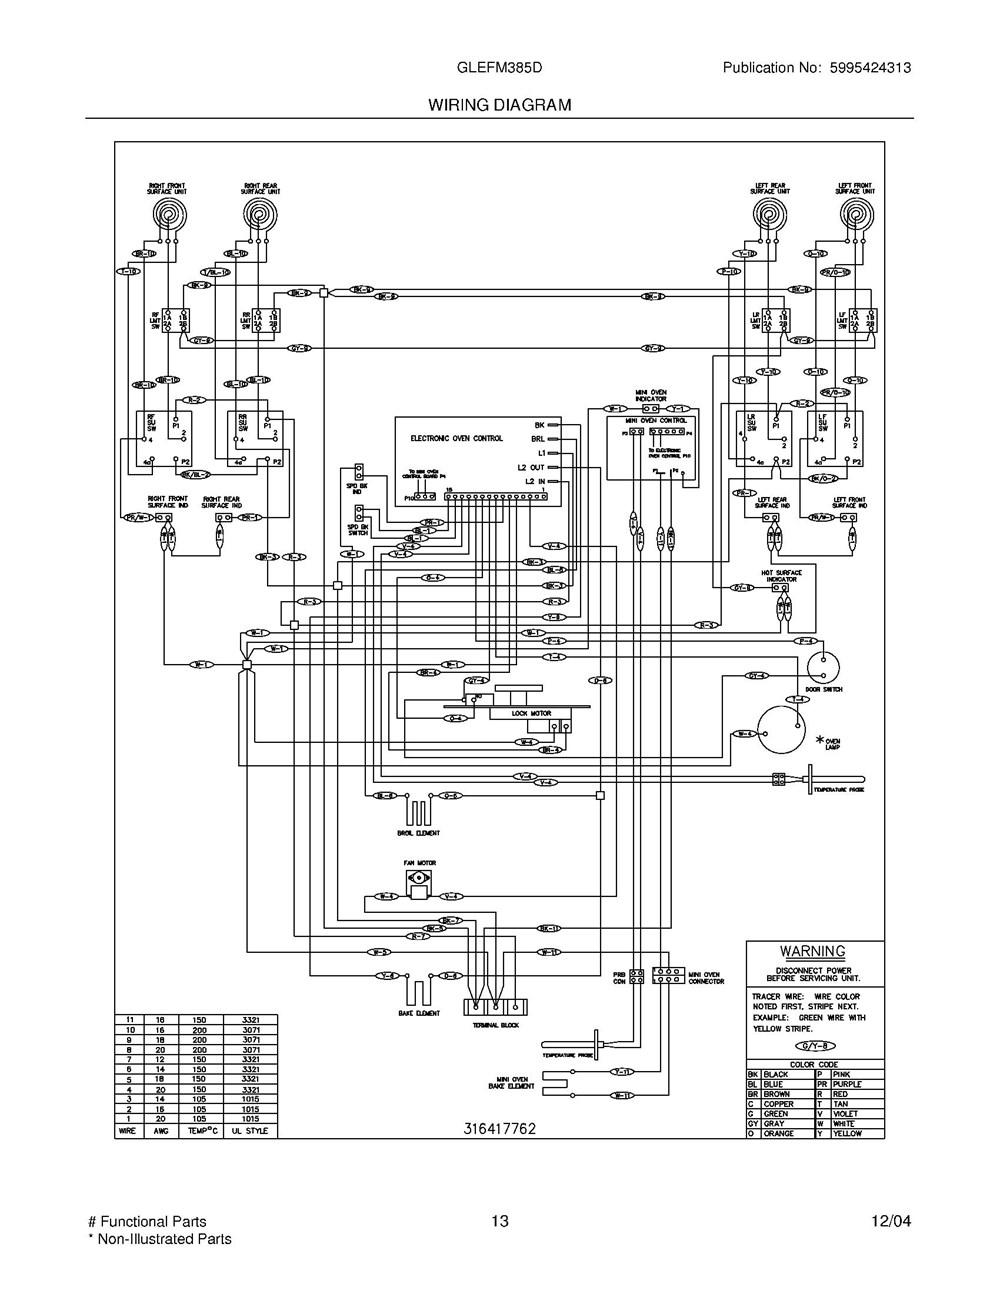 Glefm385dqb Frigidaire Company Appliance Parts Backguard 05body 07top Drawer 09door 01cover 10wiring Diagram